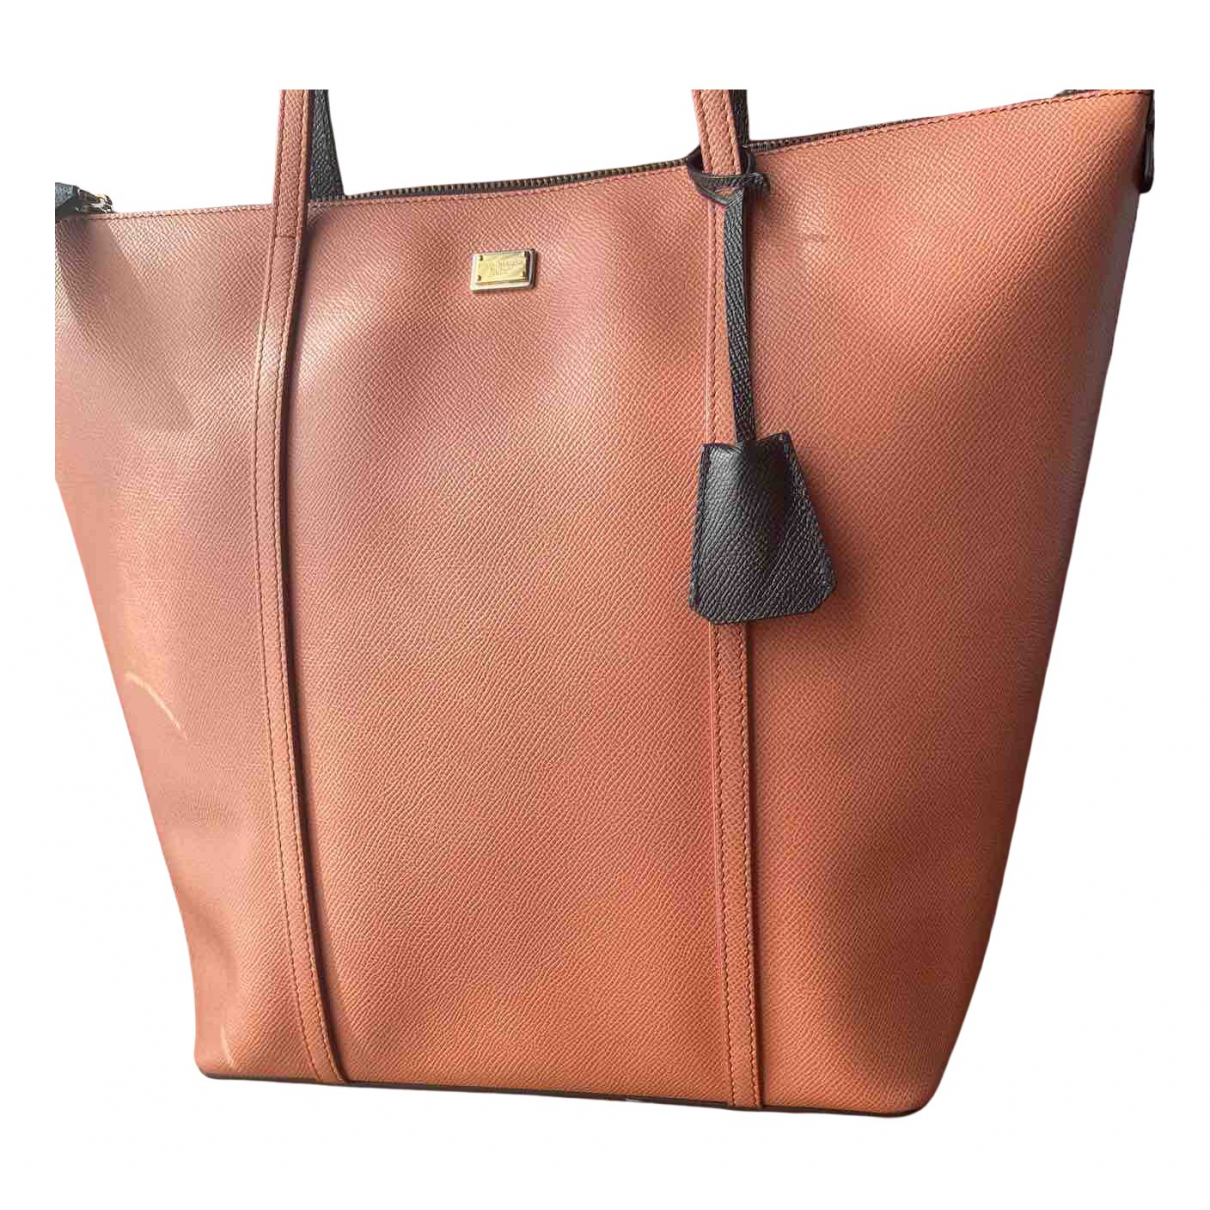 Dolce & Gabbana N Black Leather handbag for Women N